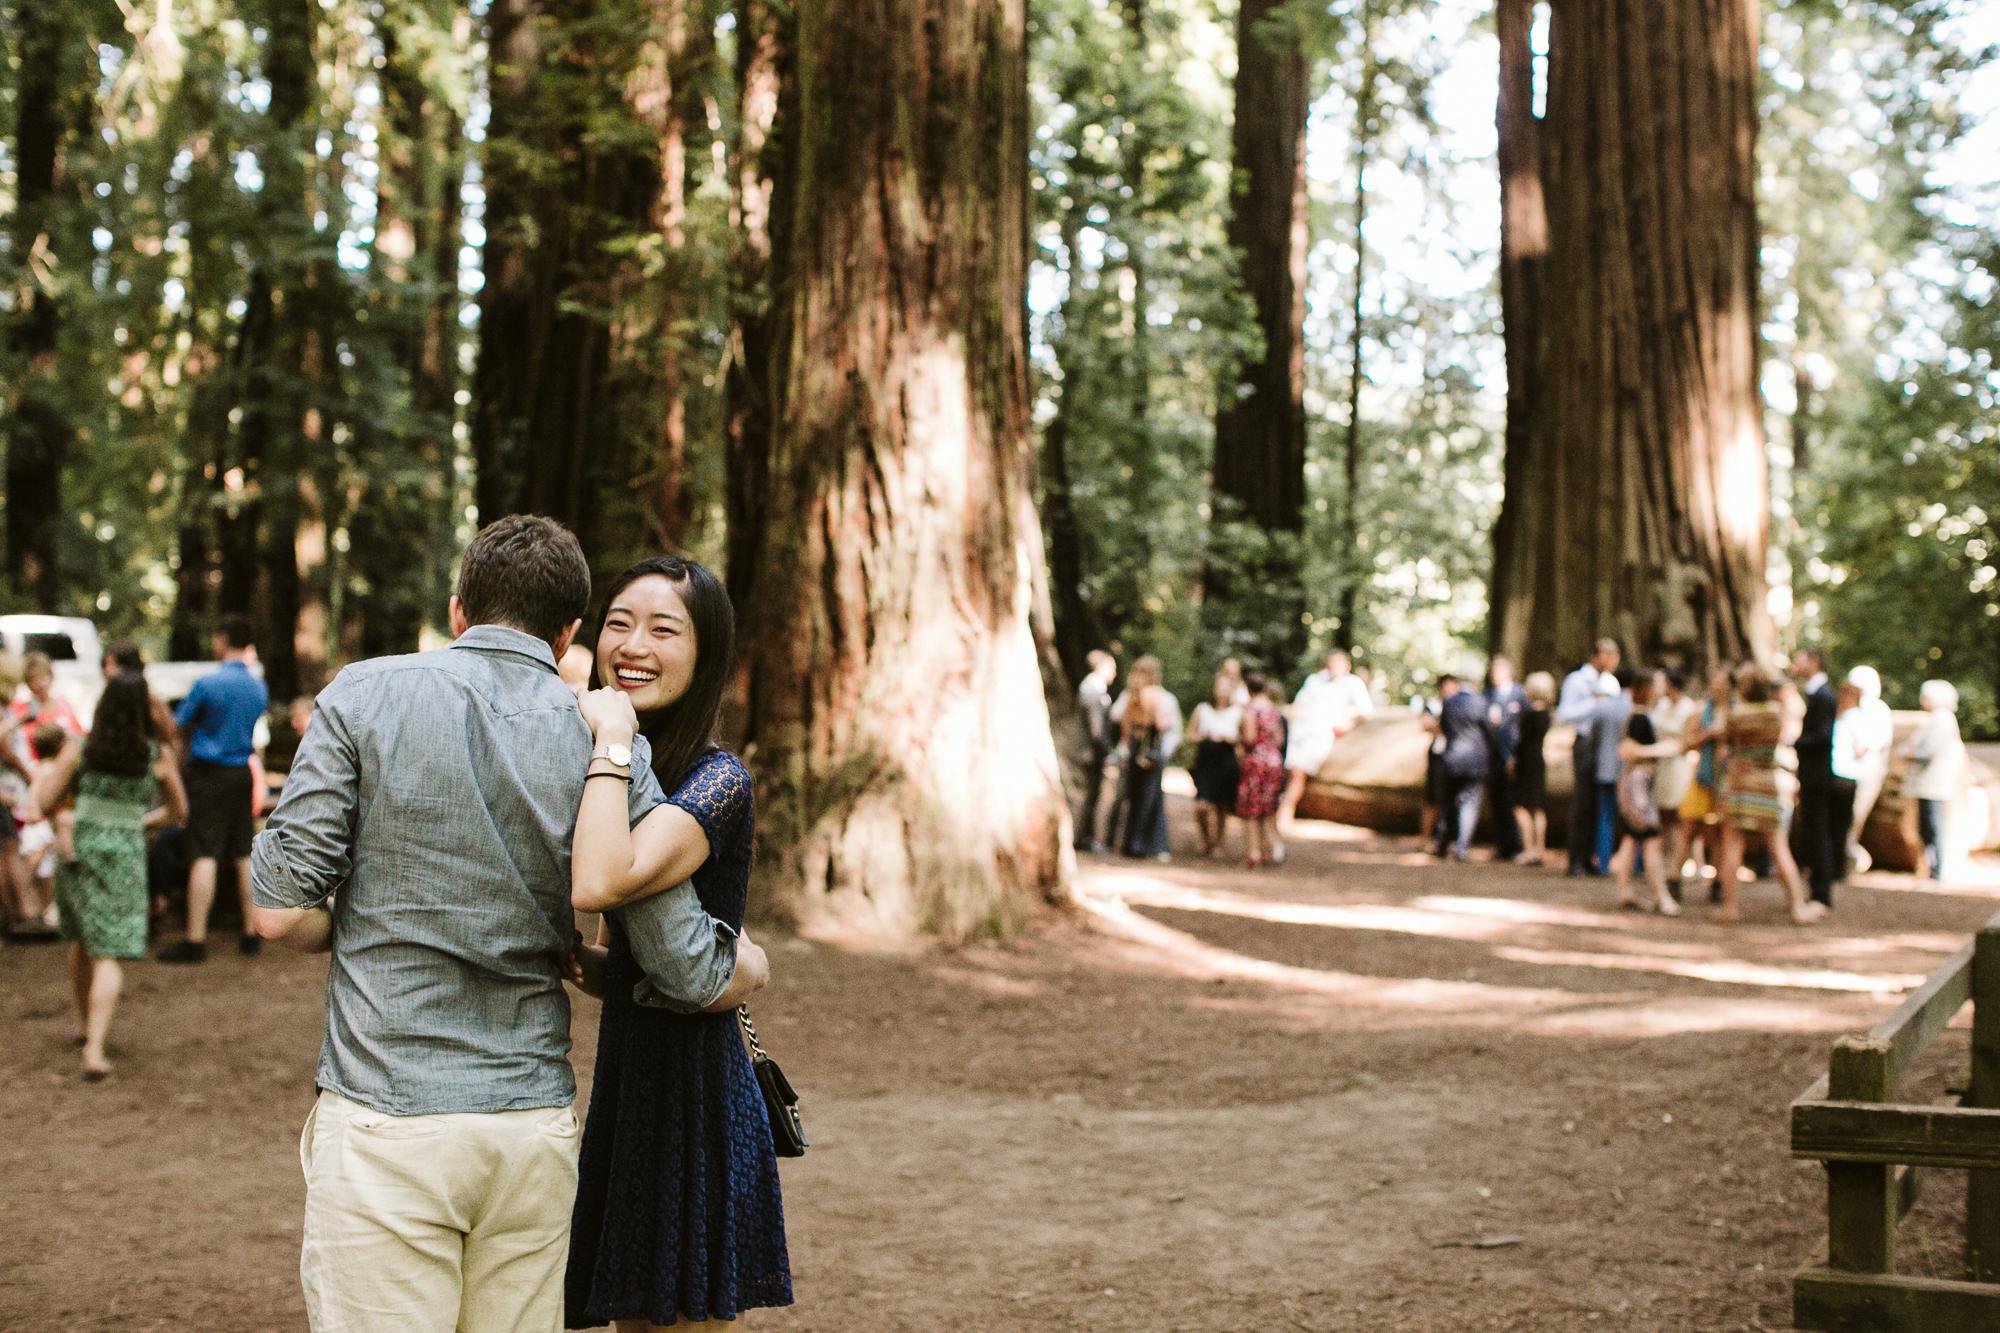 California-wedding-photographer-alfonso-flores-pamplin-groove-237.jpg